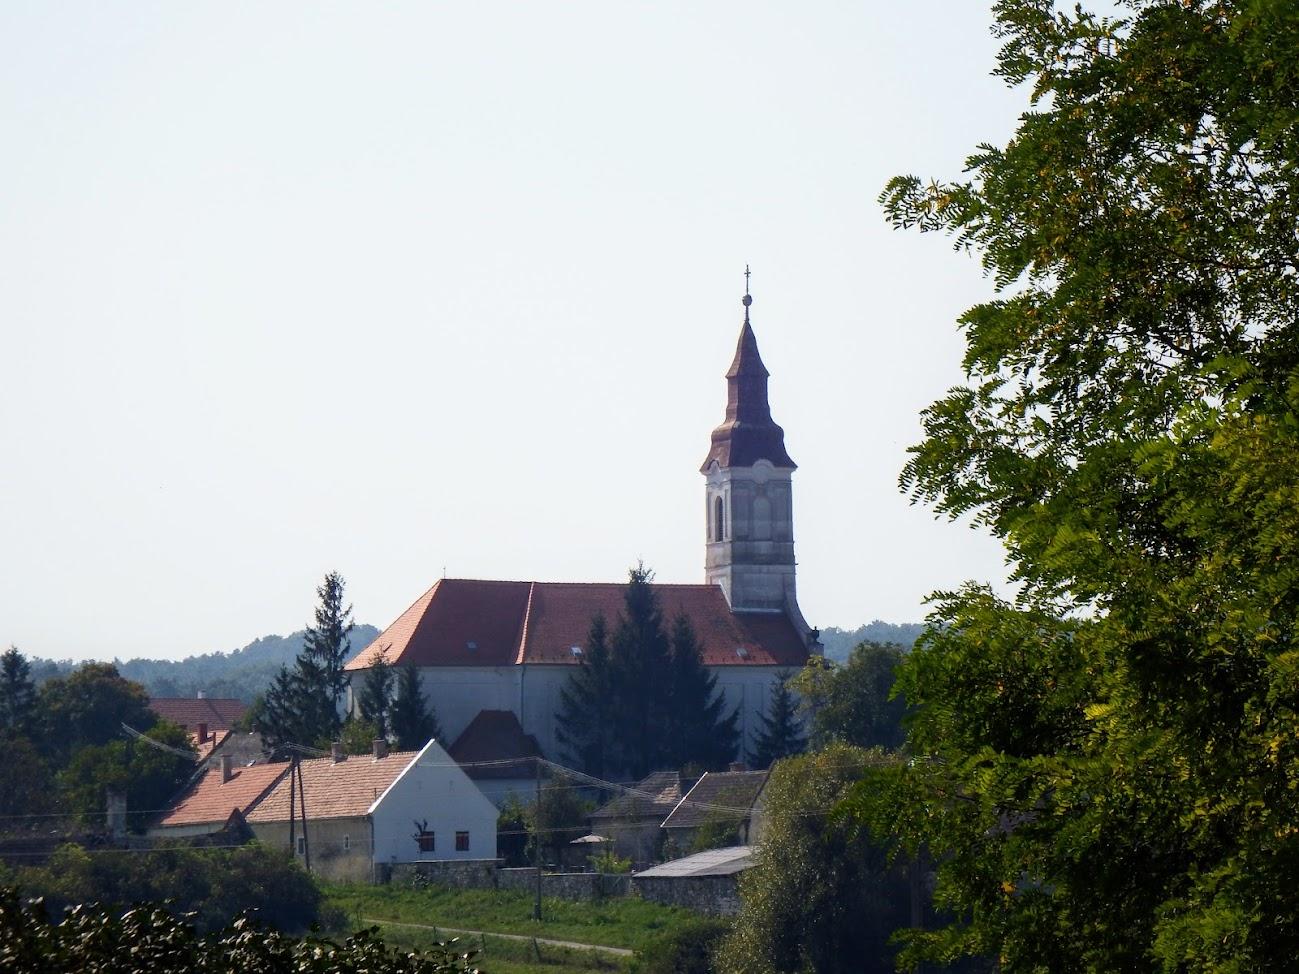 Barnag - Szent Márton püspök rk. templom